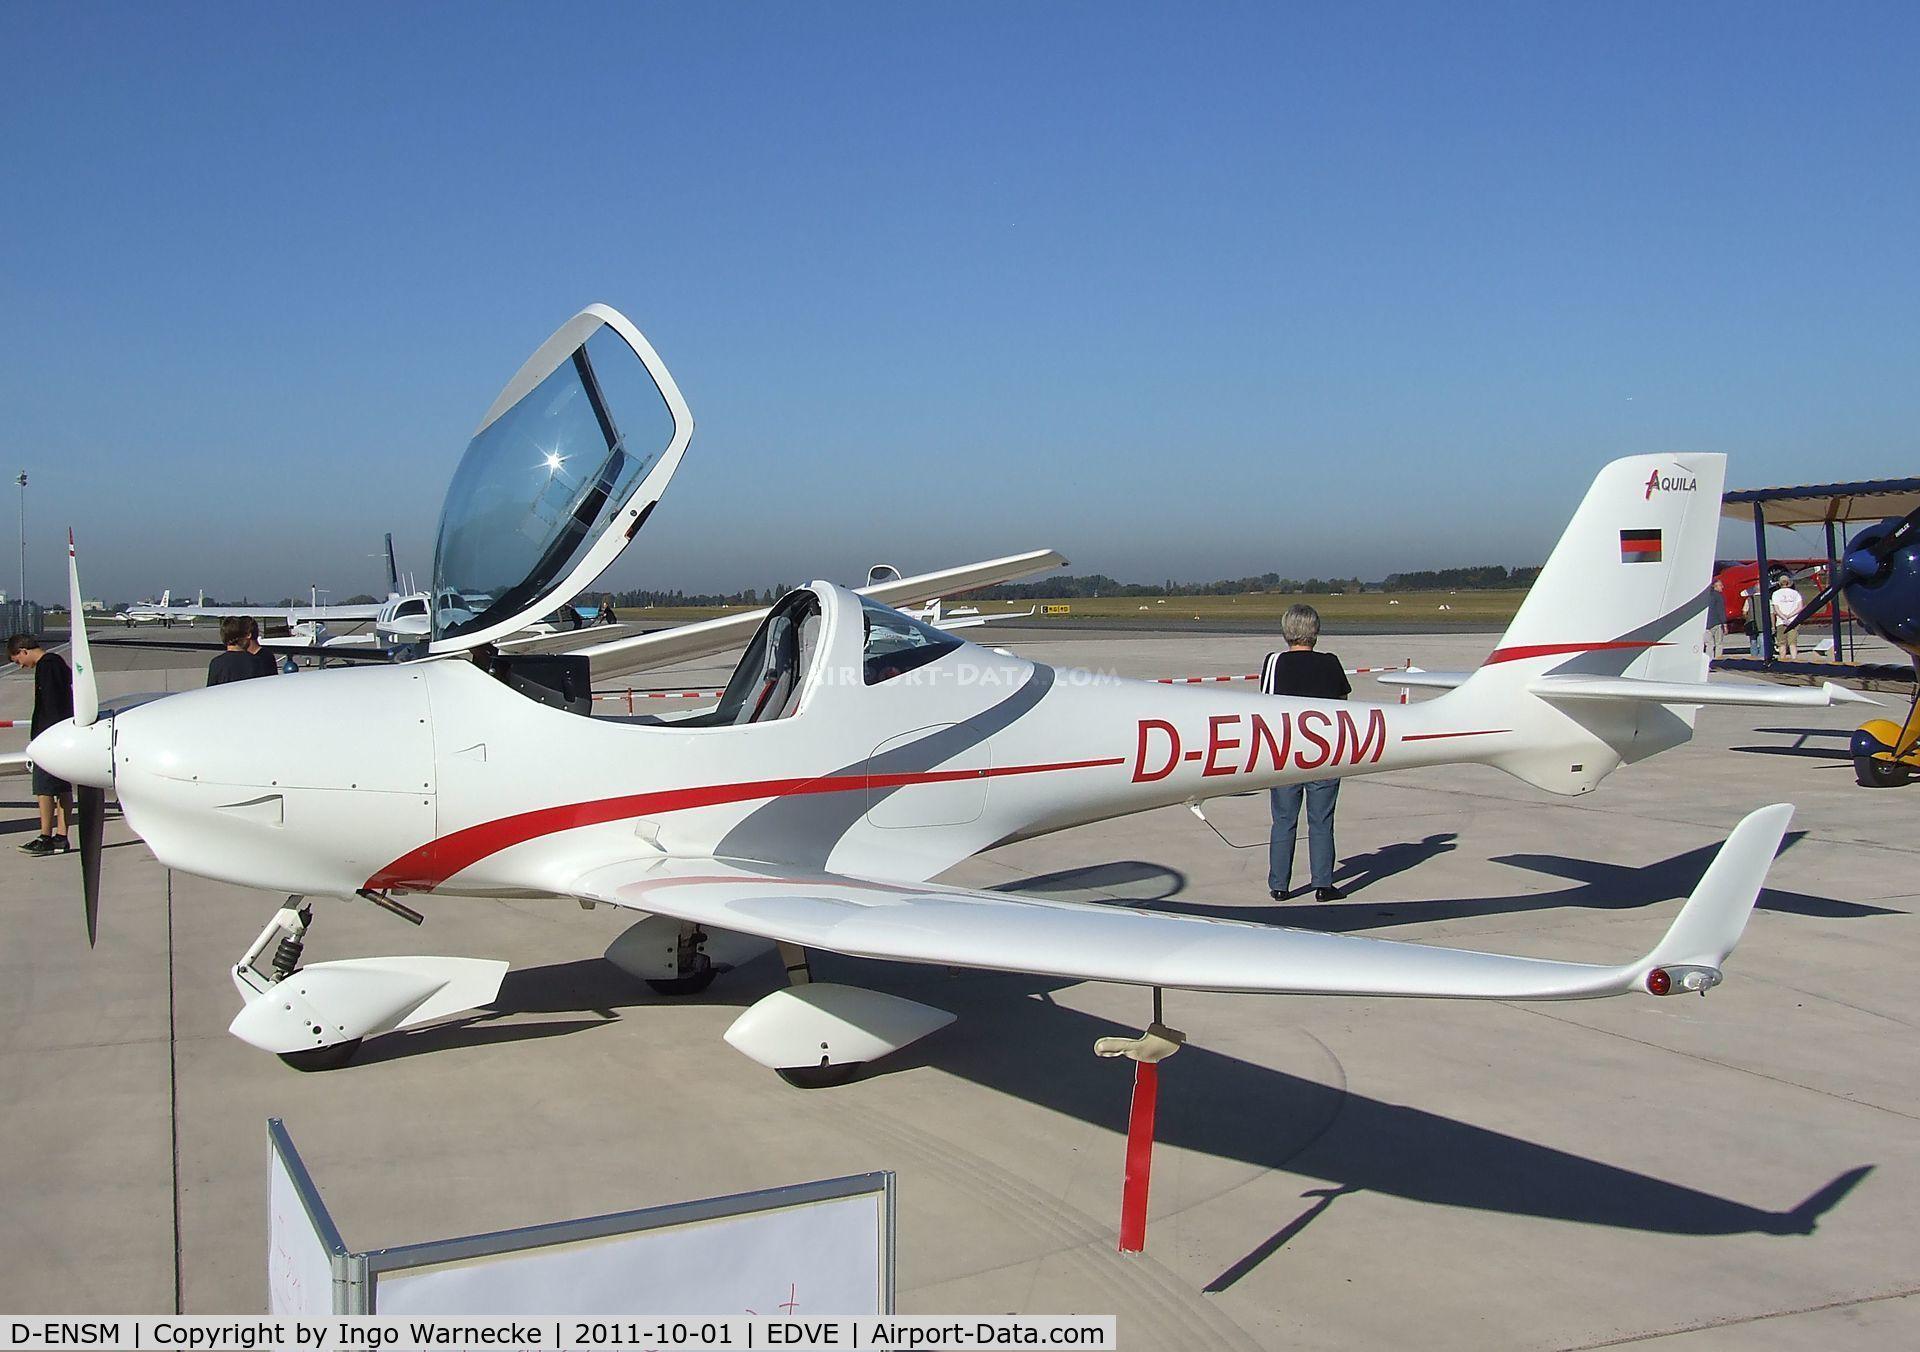 D-ENSM, Aquila A210 (AT01) C/N AT01-129, Aquila AT-01 A210 at Braunschweig-Waggum airport